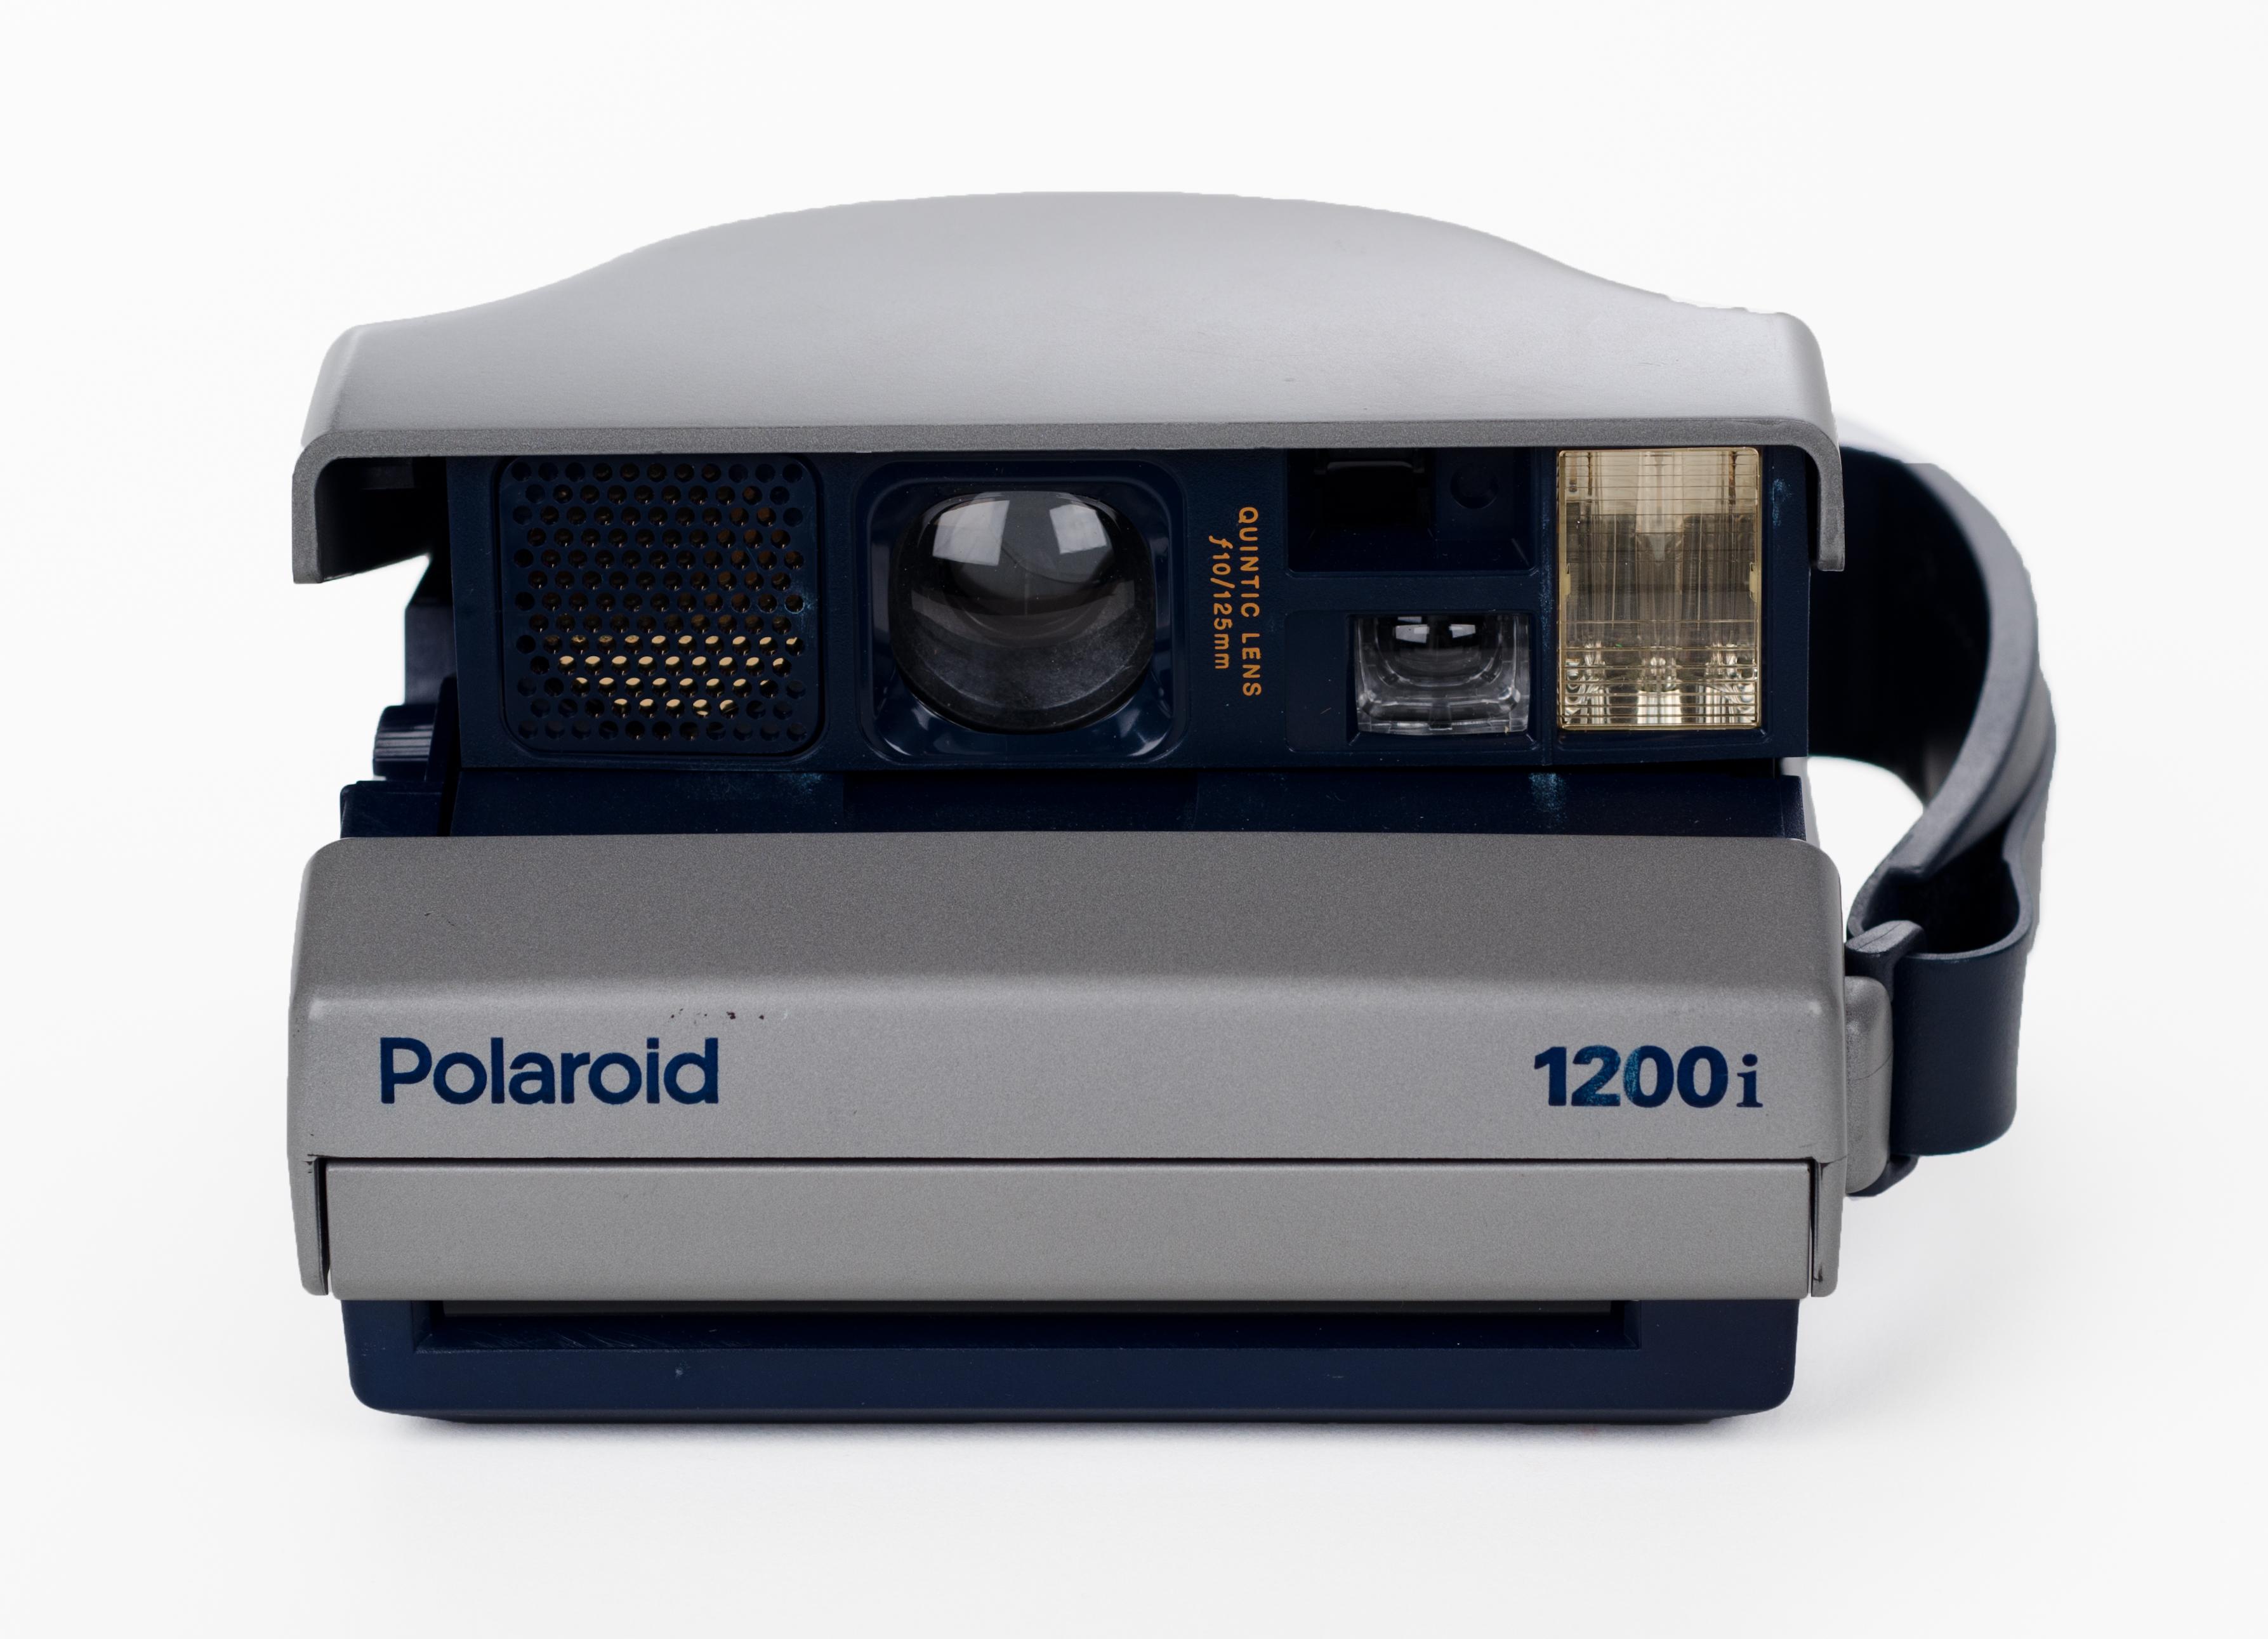 polaroid 1200i camera review. Black Bedroom Furniture Sets. Home Design Ideas